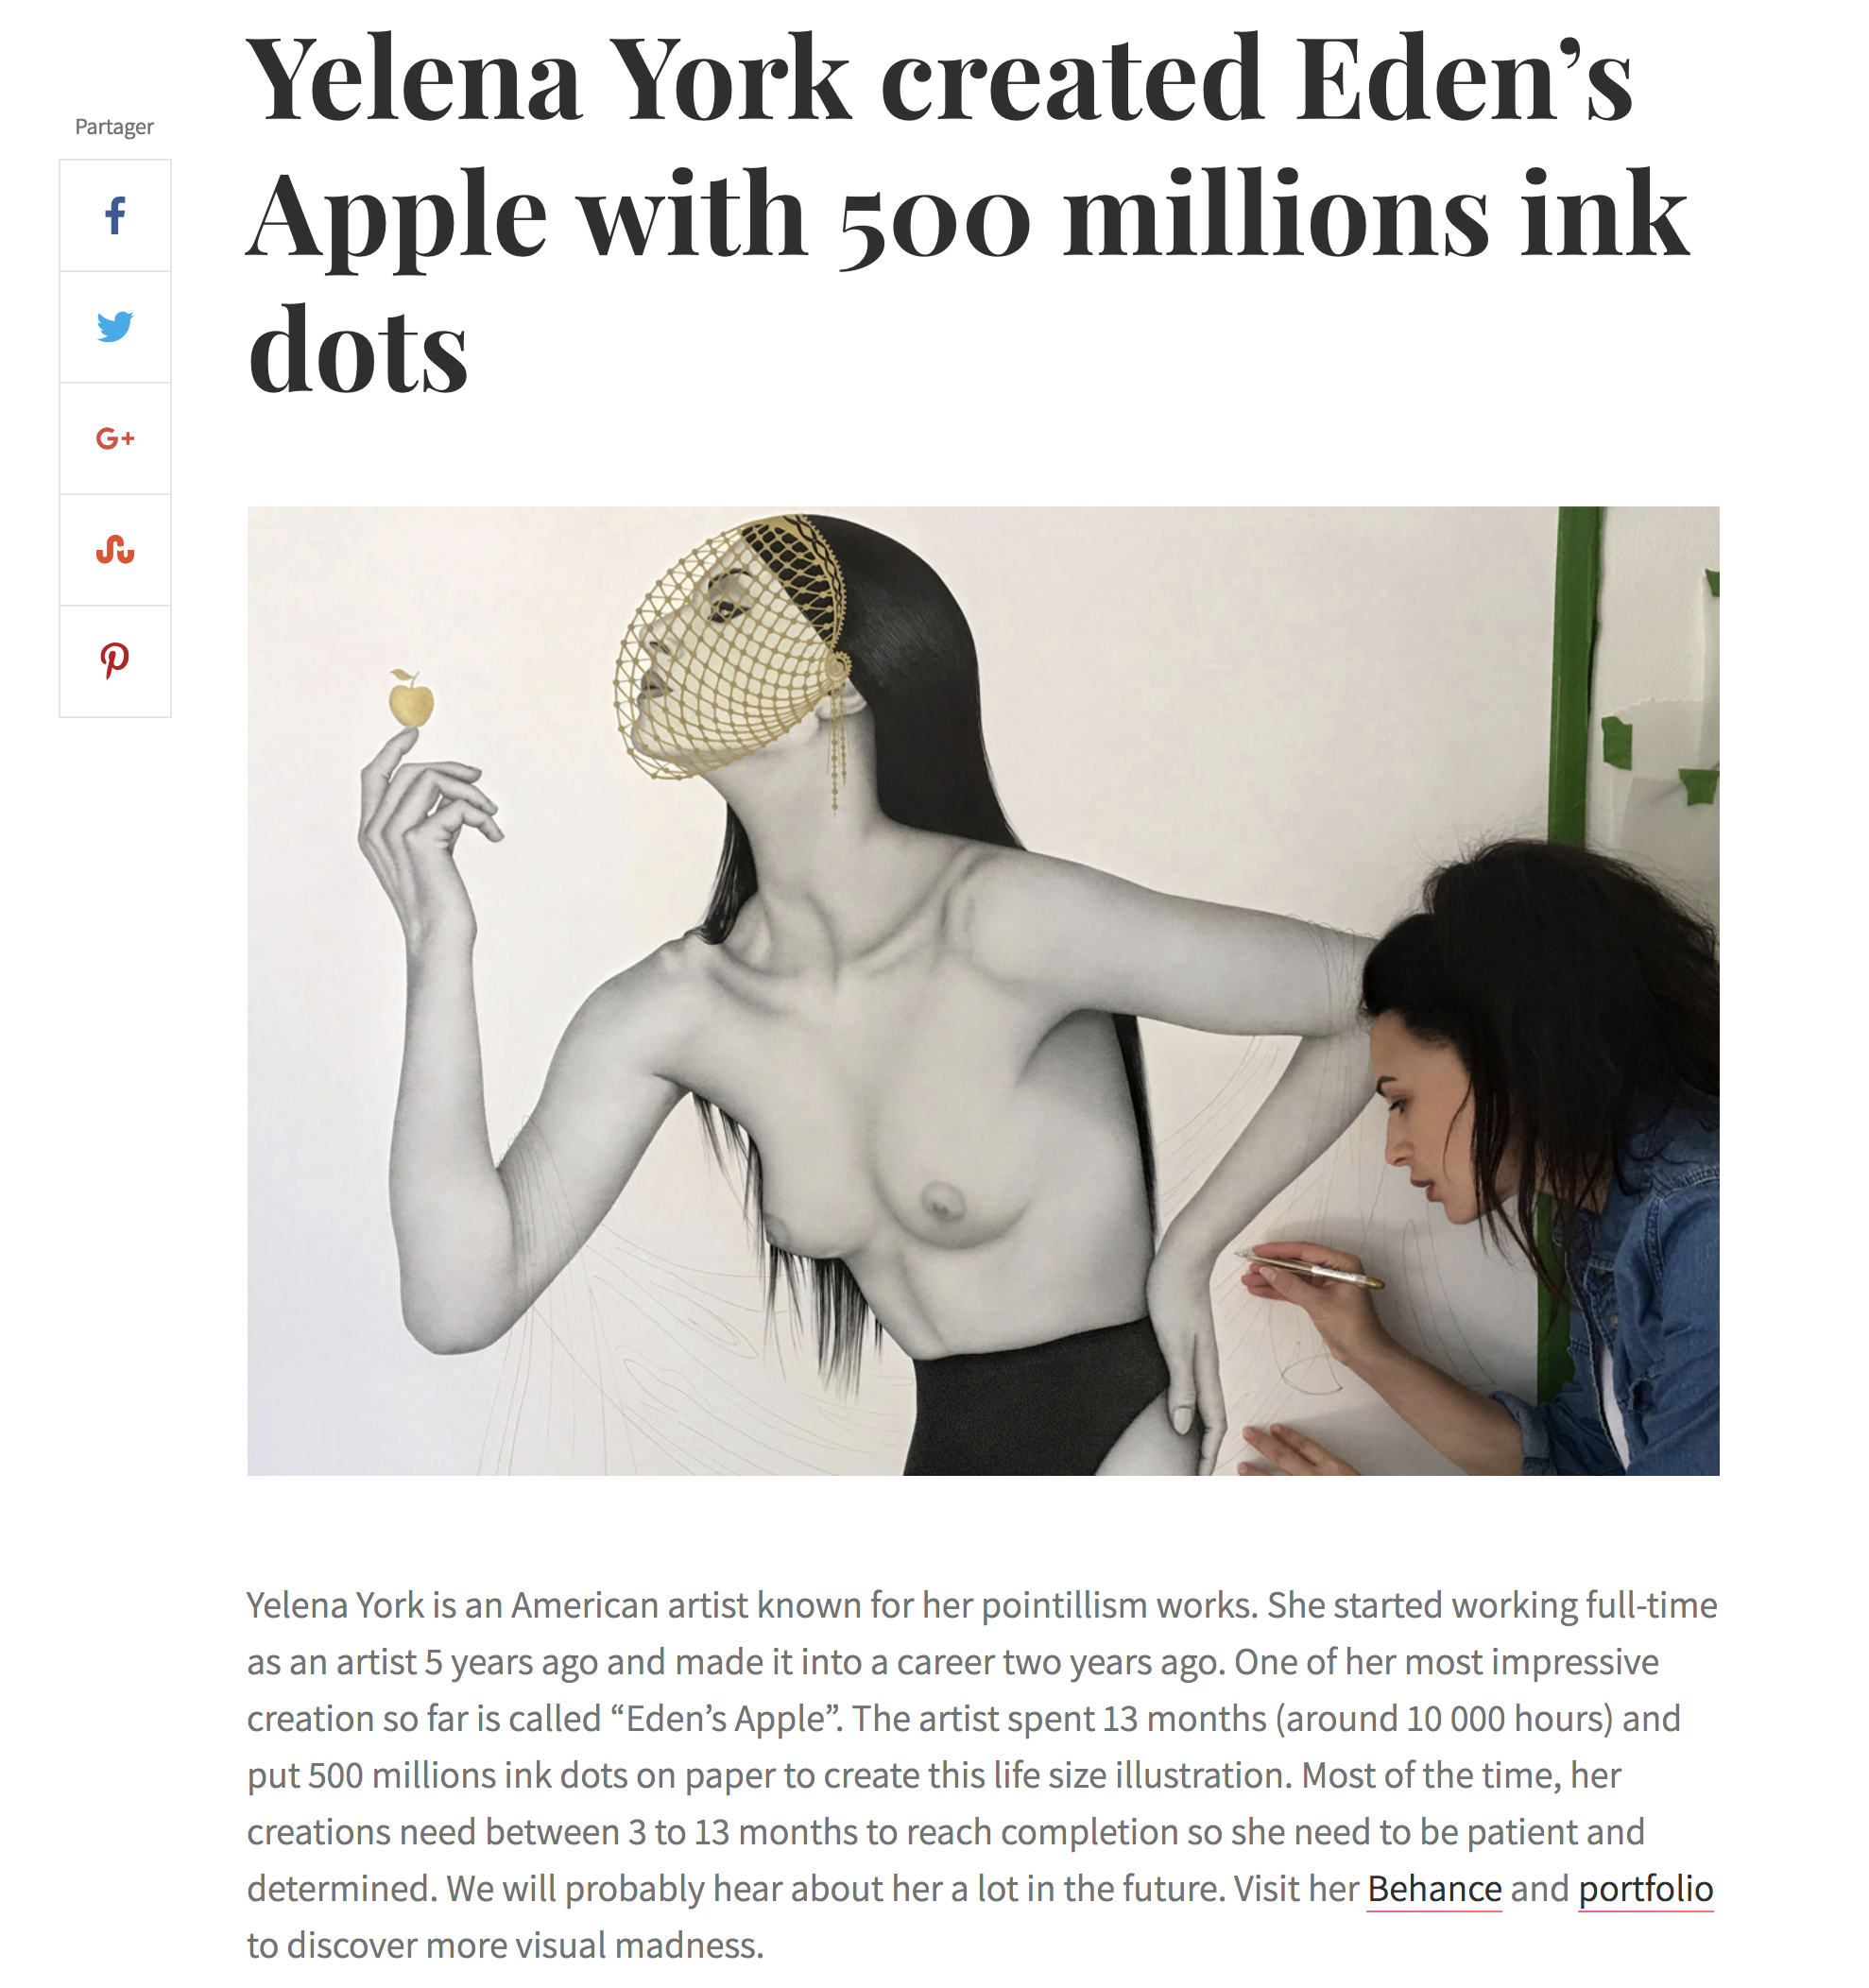 ART-SPIRE - read full article